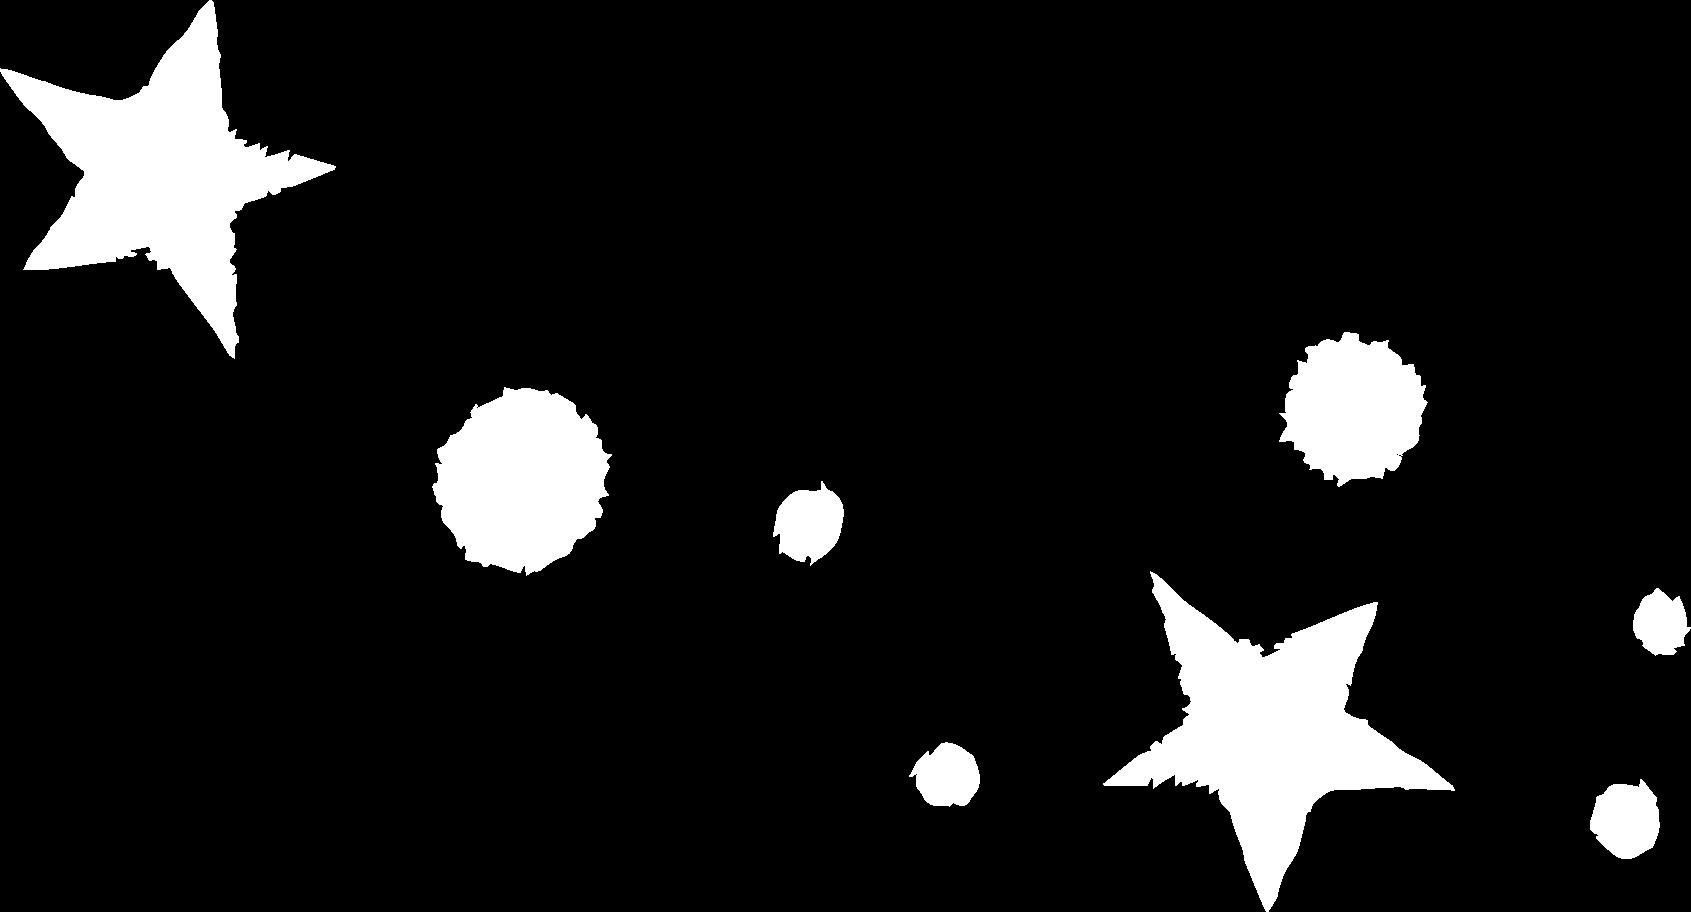 star bg Clipart illustration in PNG, SVG